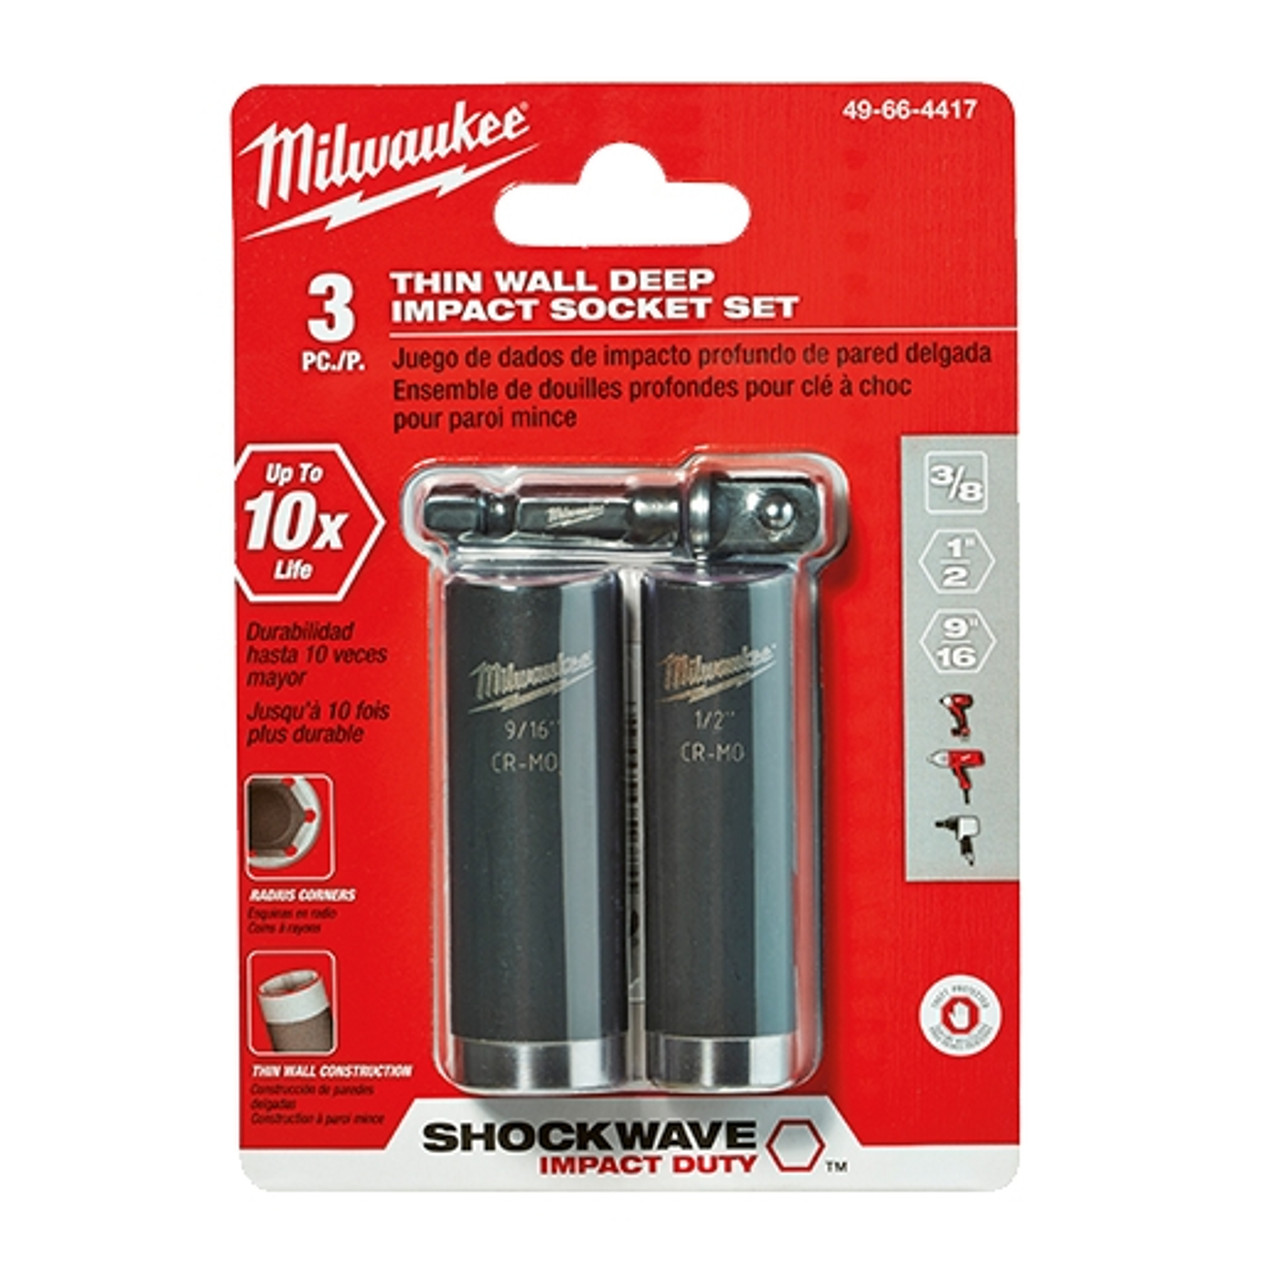 Milwaukee 49-66-4417 3 pc. Thin Wall Deep Impact Socket Set